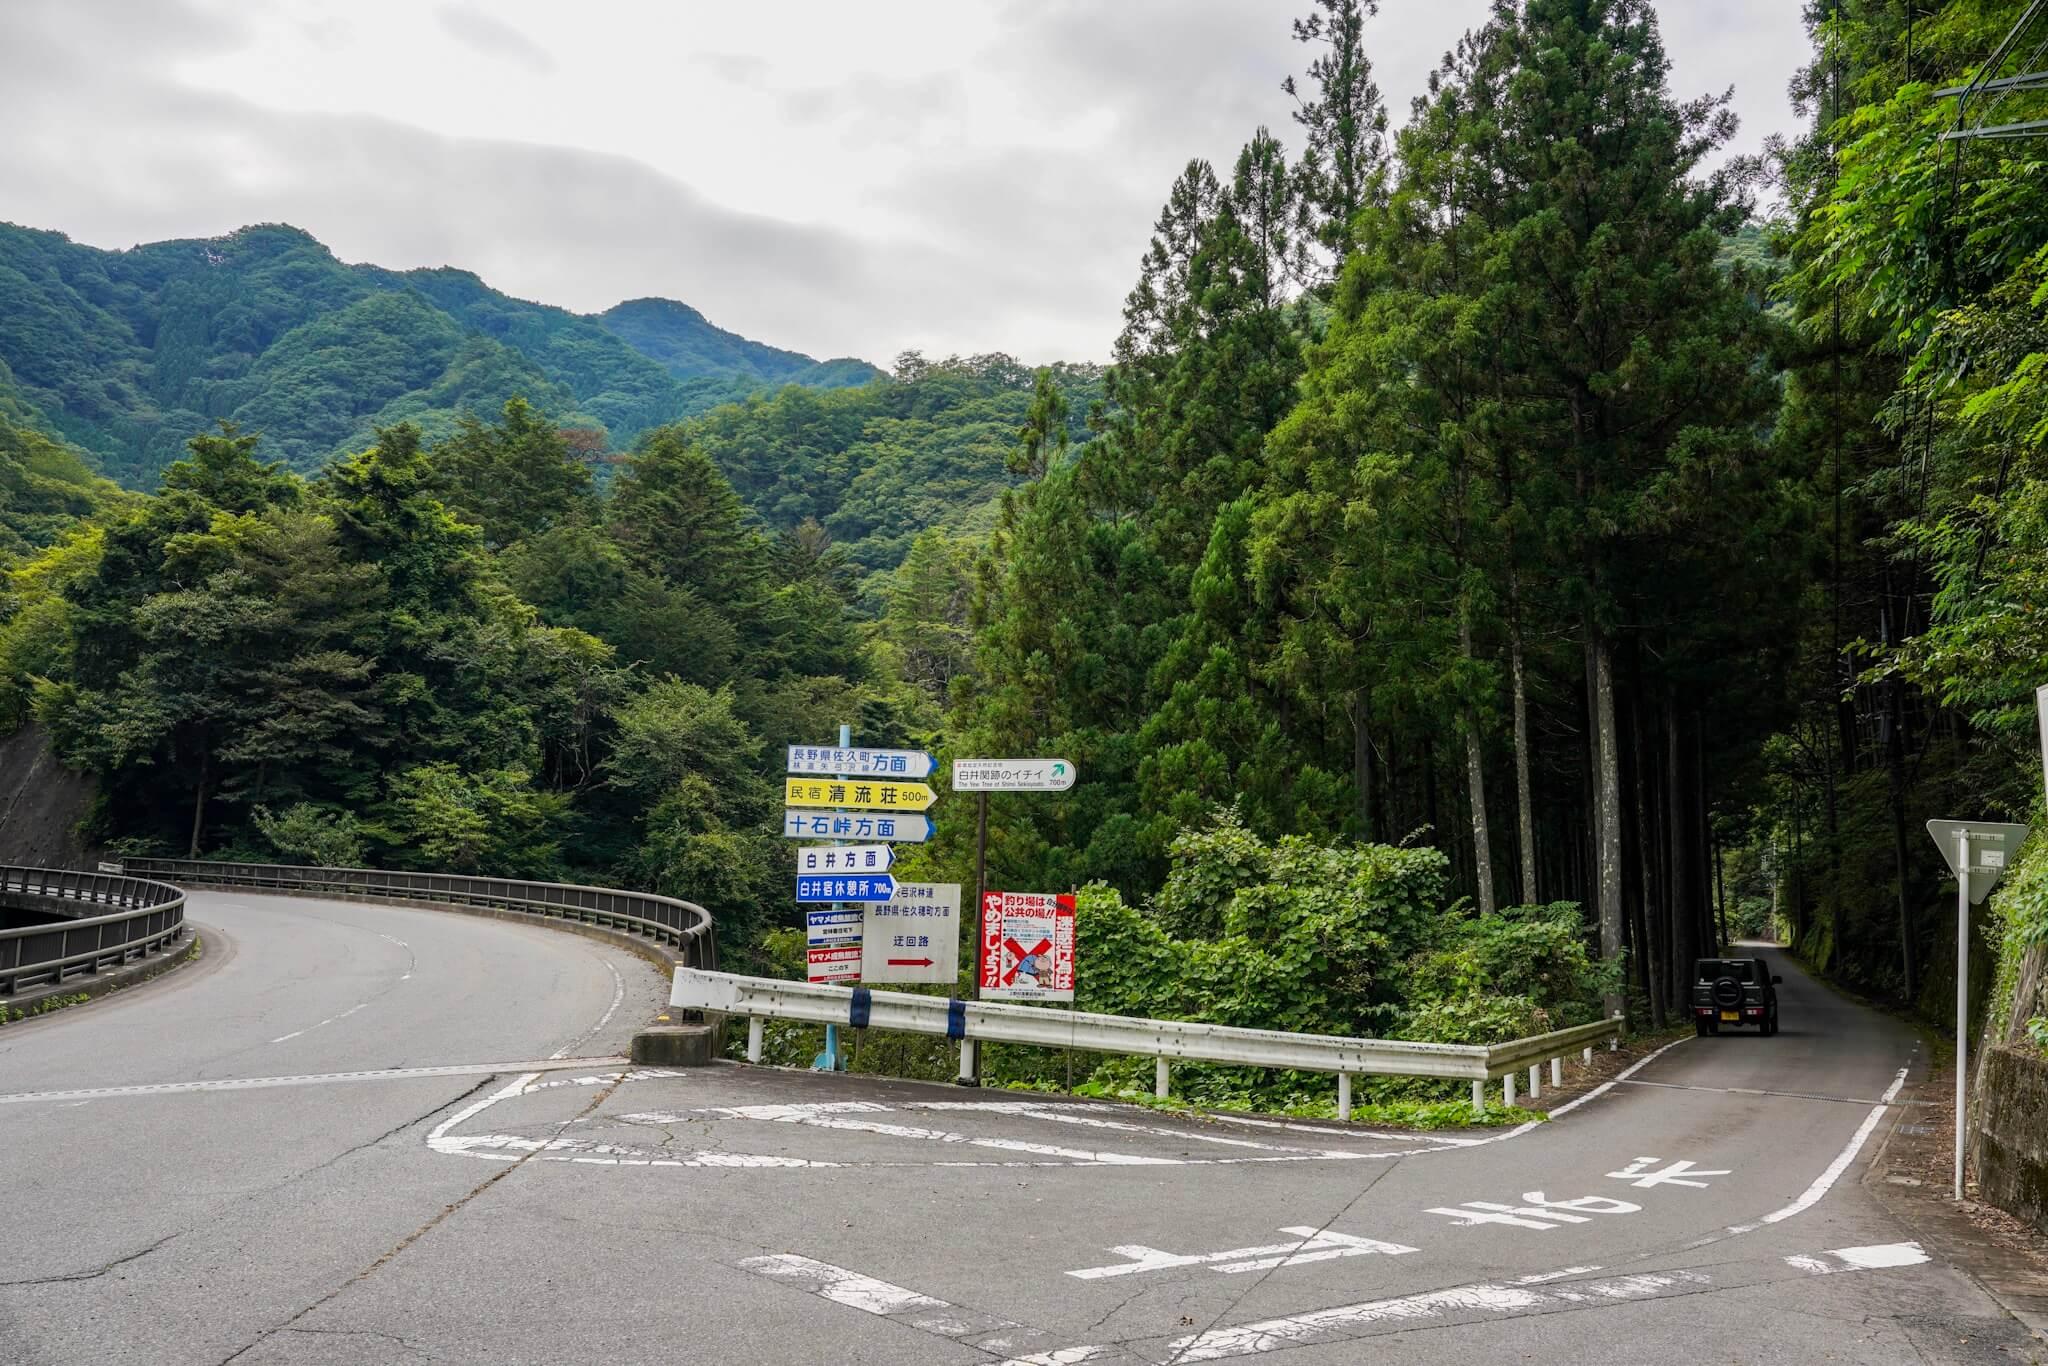 酷道299号 迂回路 林道矢弓沢線への入口